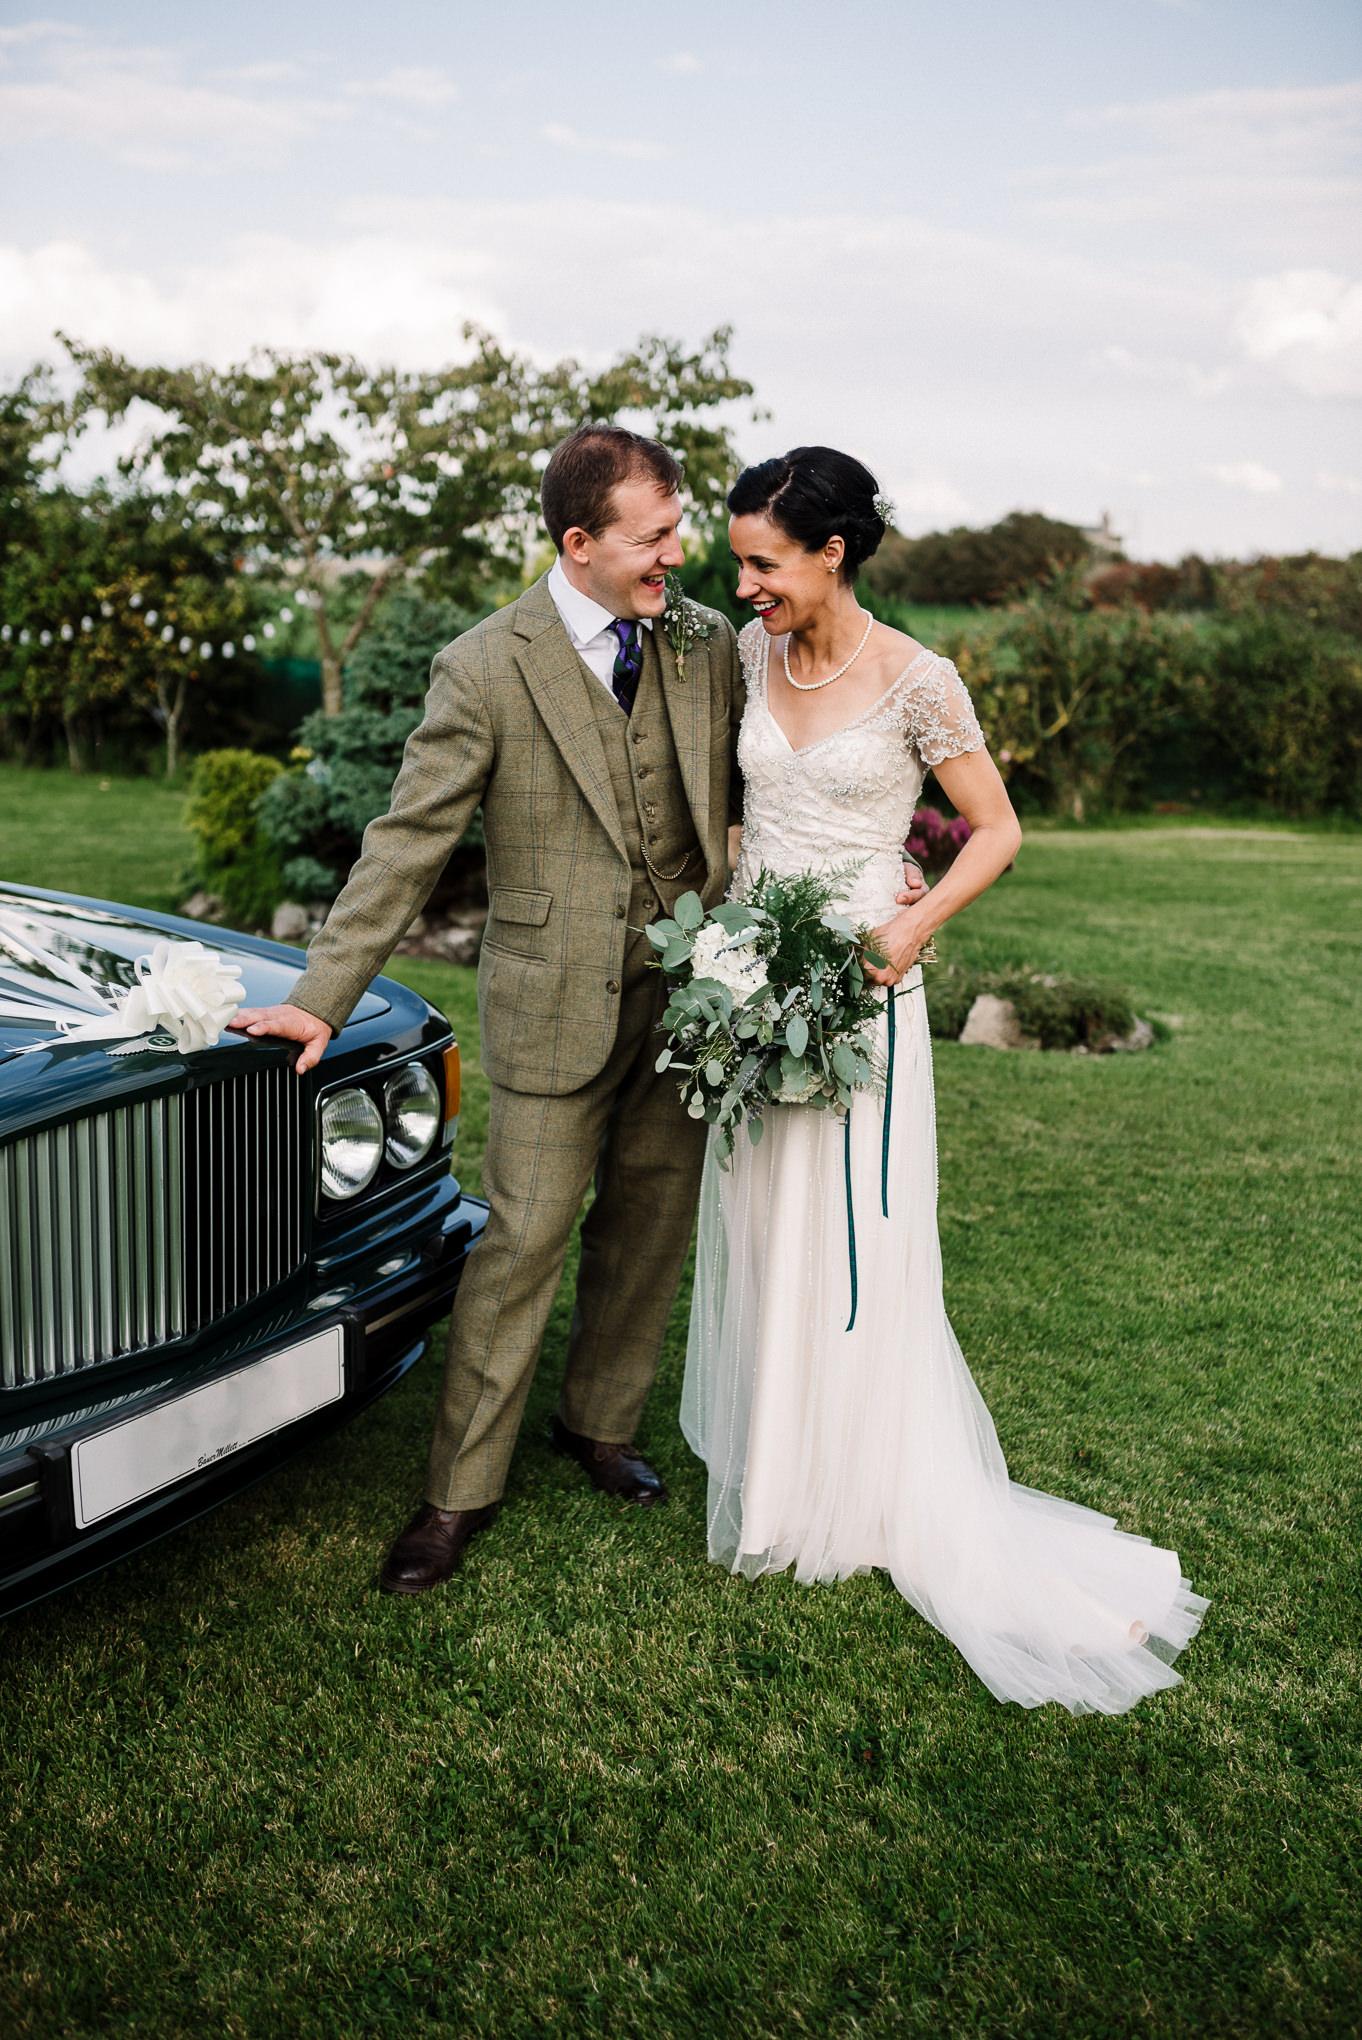 Bride and groom with wedding car. Farm wedding photography